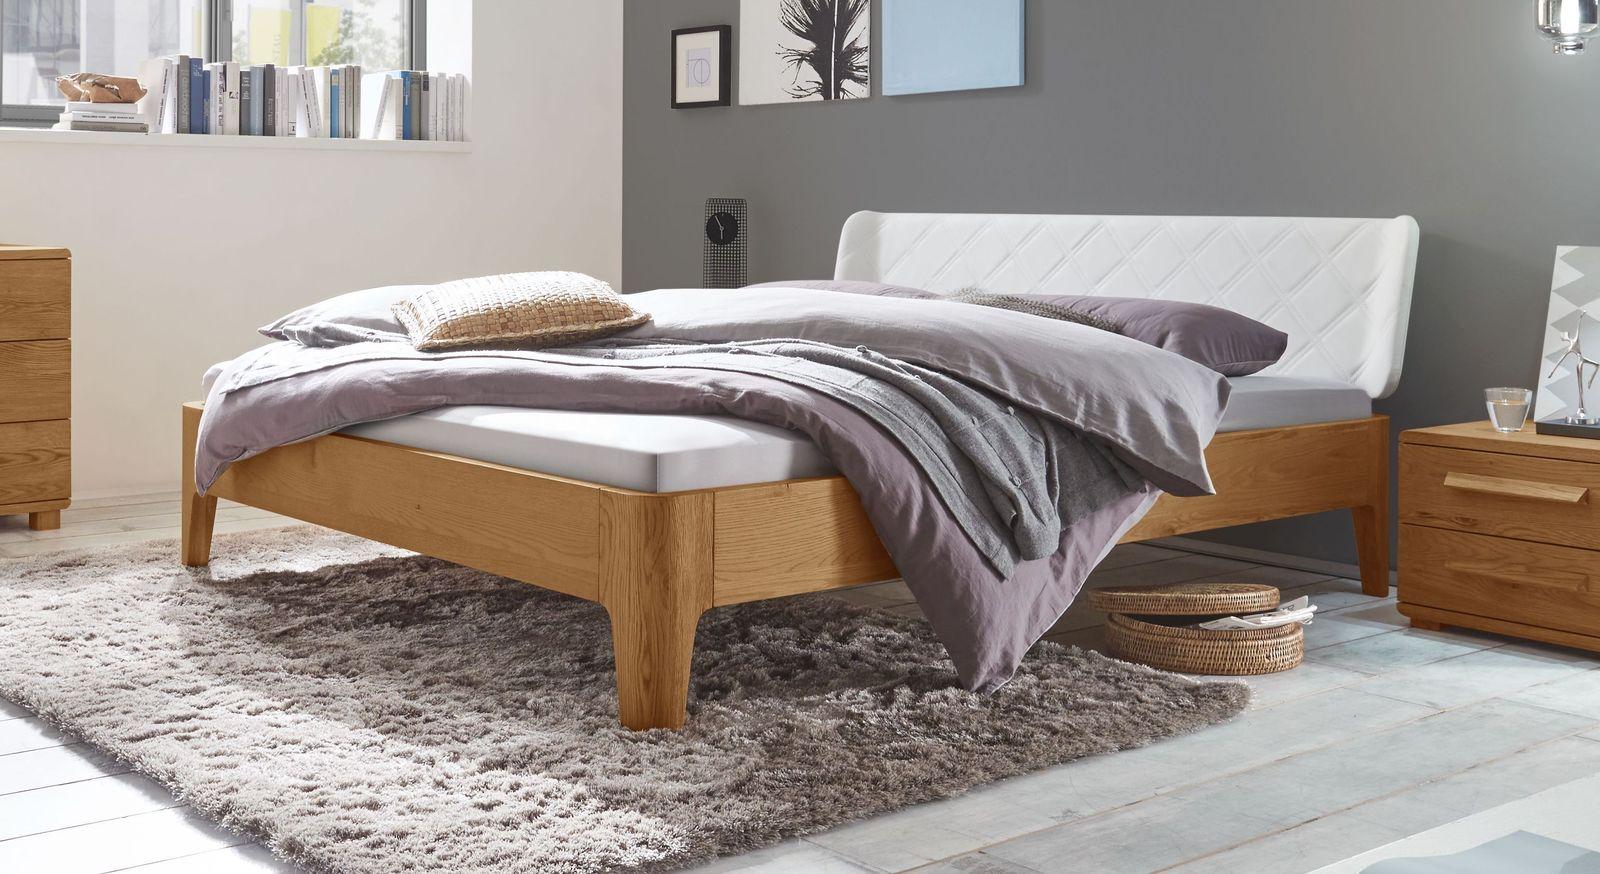 Bett Viamao aus natürlichem Eichenholz